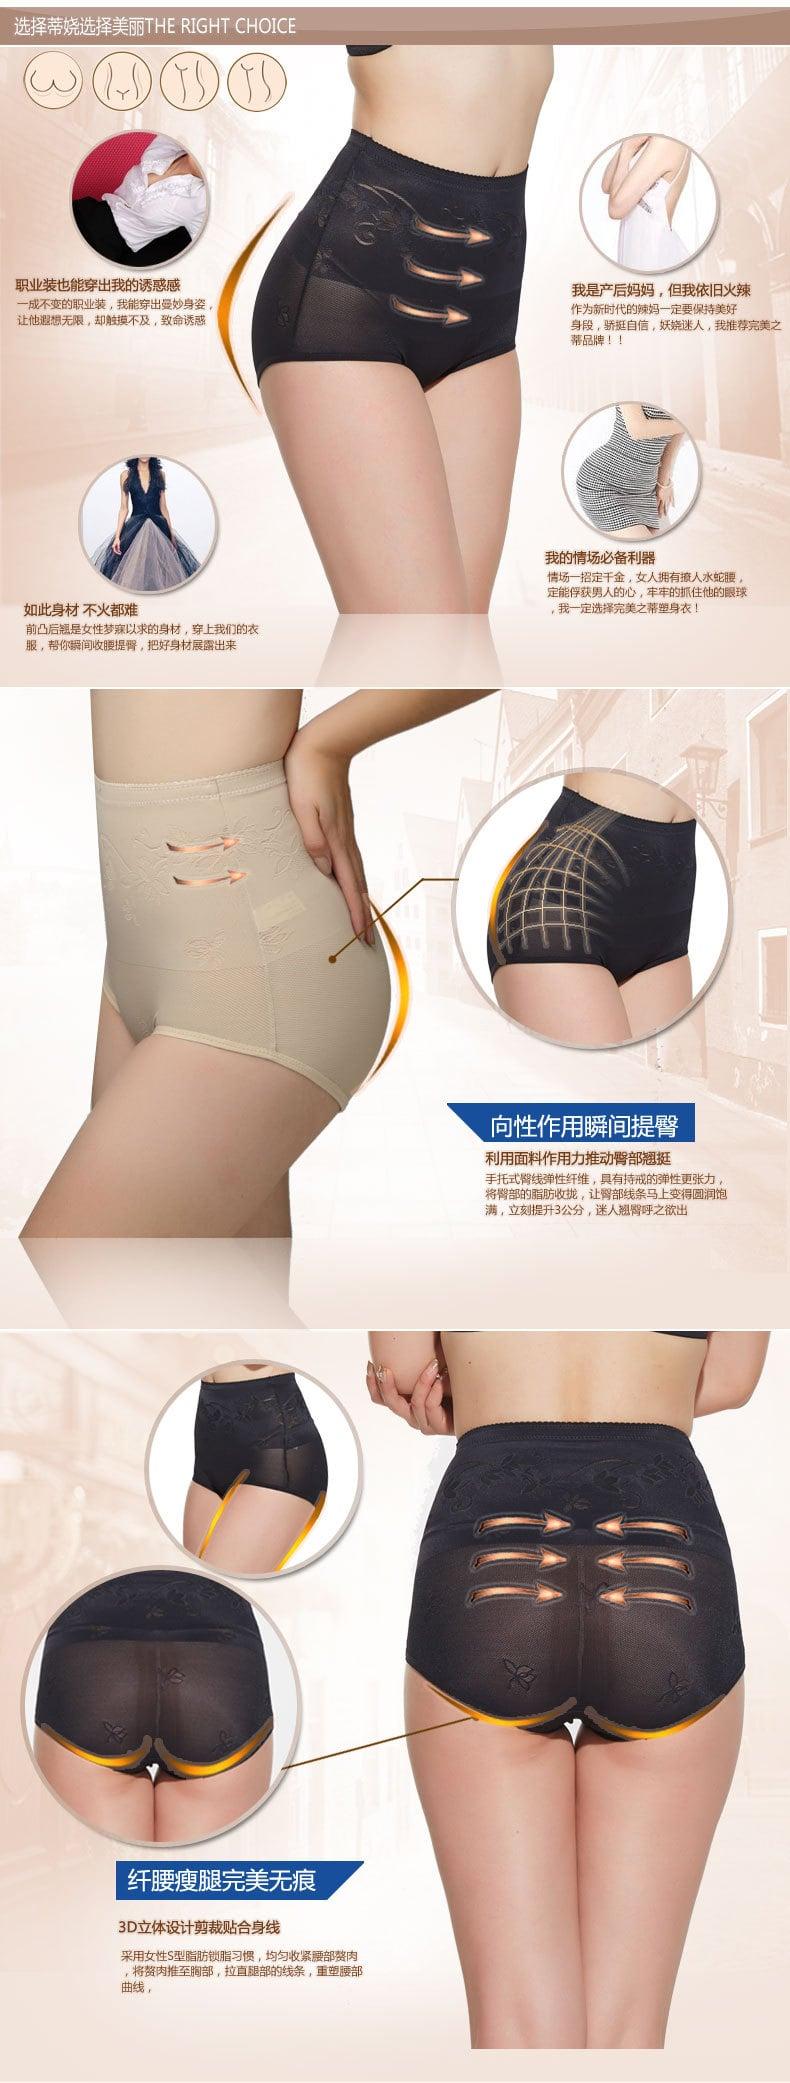 Low Waist Body Shaper - Features